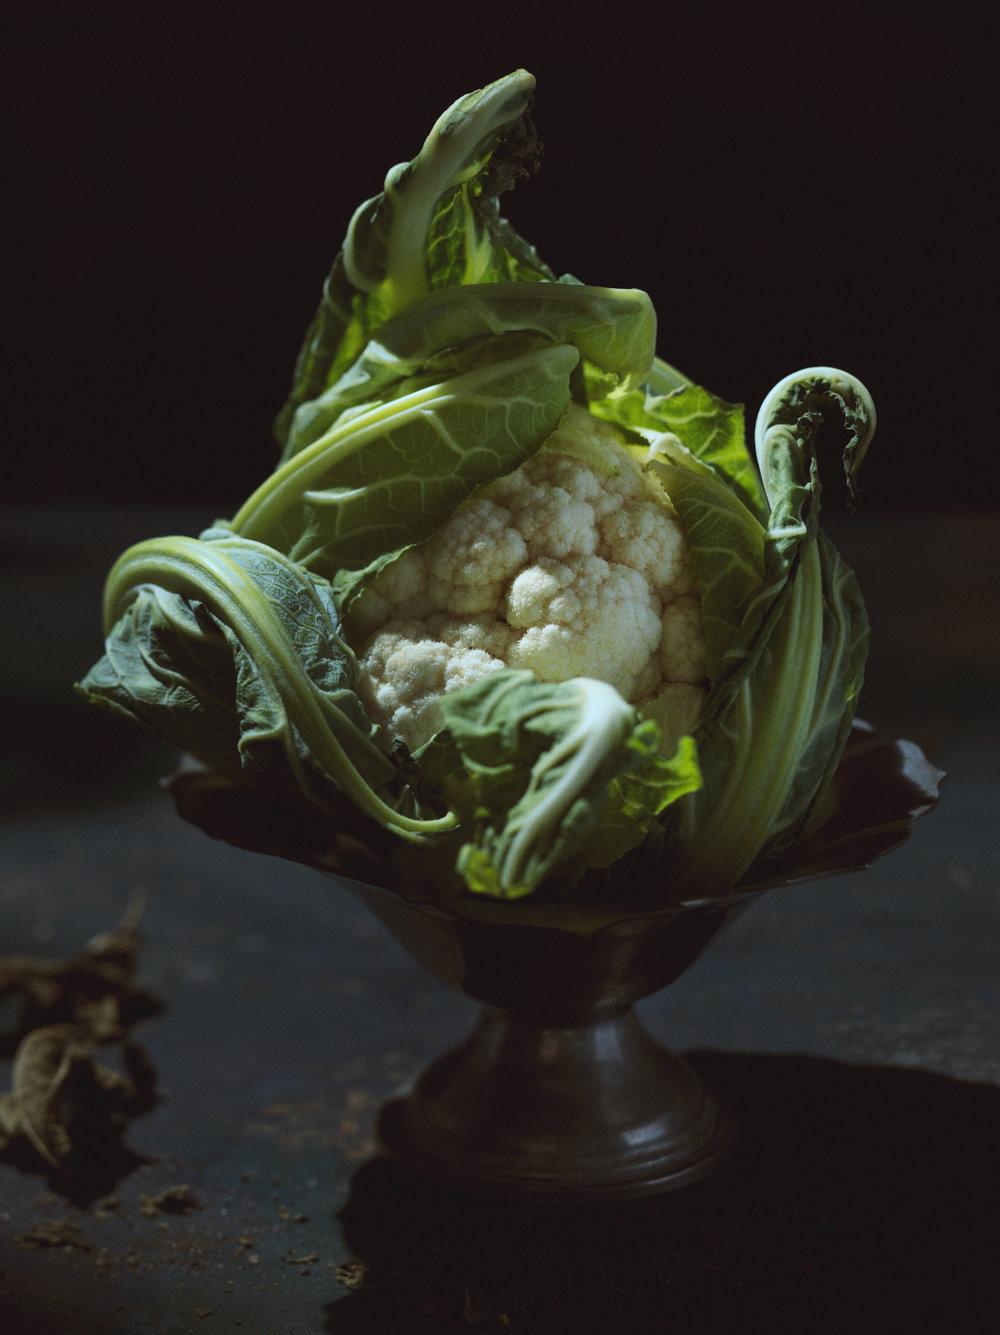 cauliflower still life art food photos